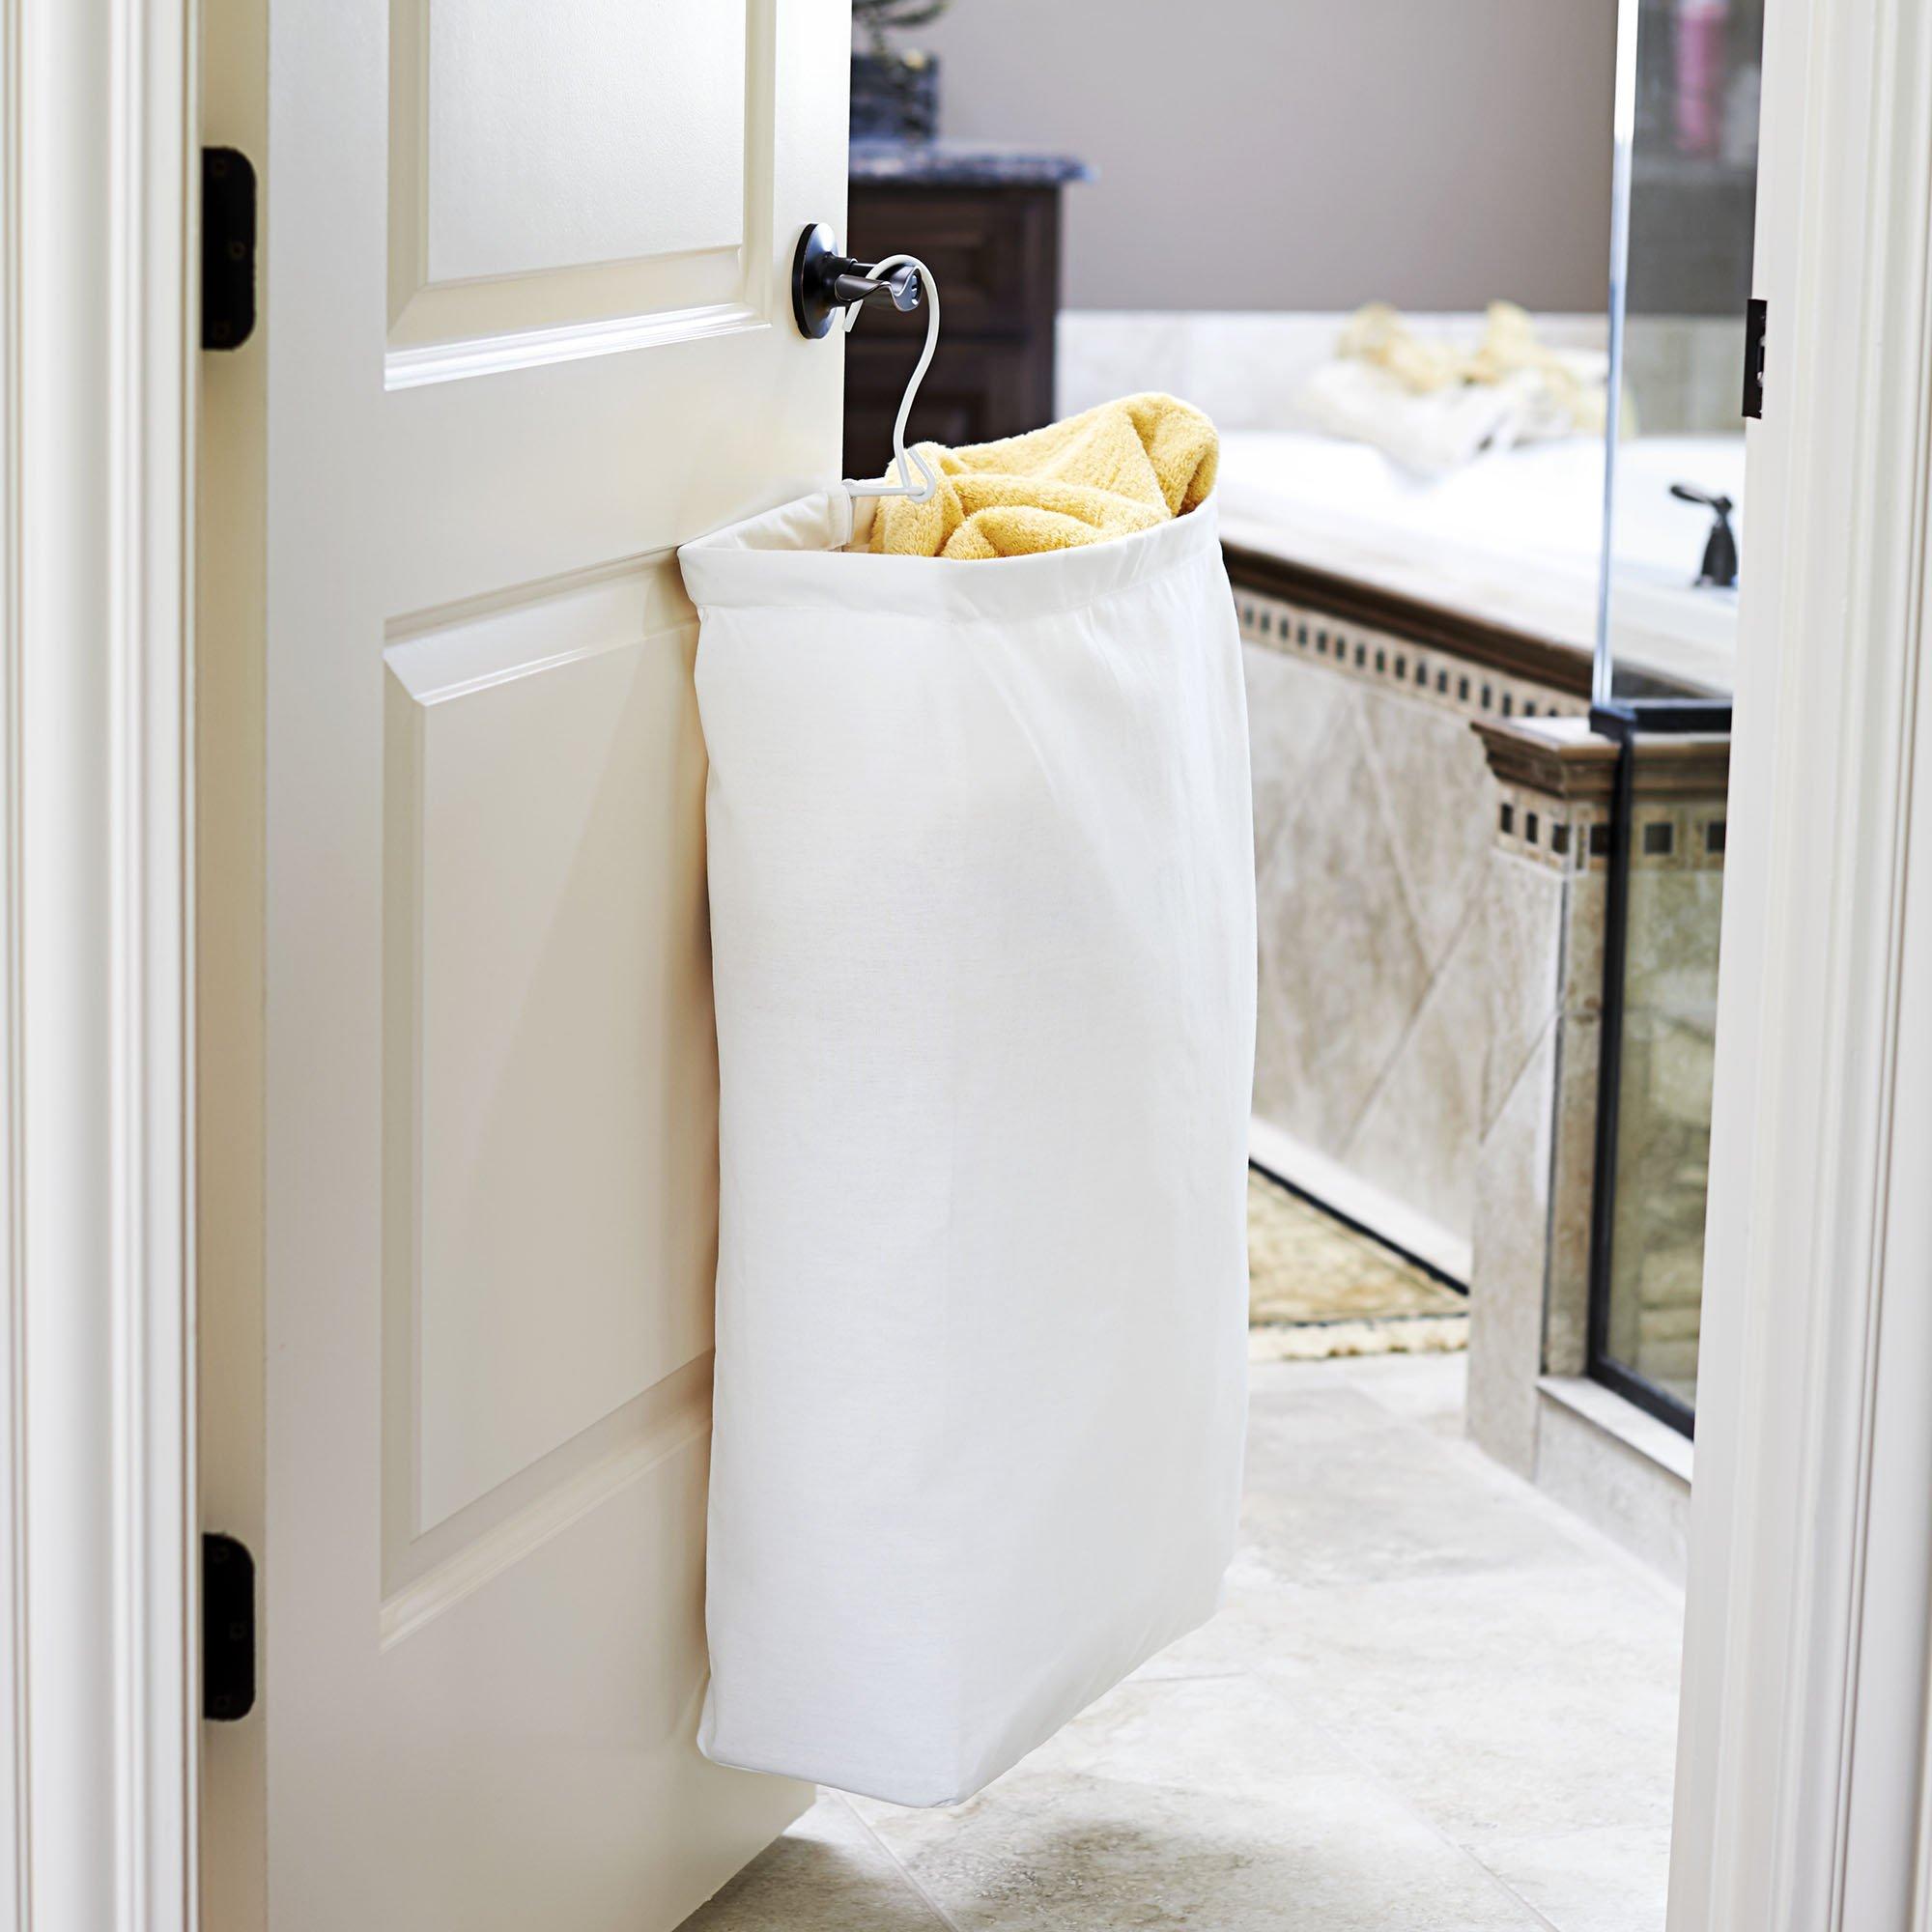 Household Essentials 148 Hanging Cotton Canvas Laundry Hamper Bag | White by Household Essentials (Image #4)